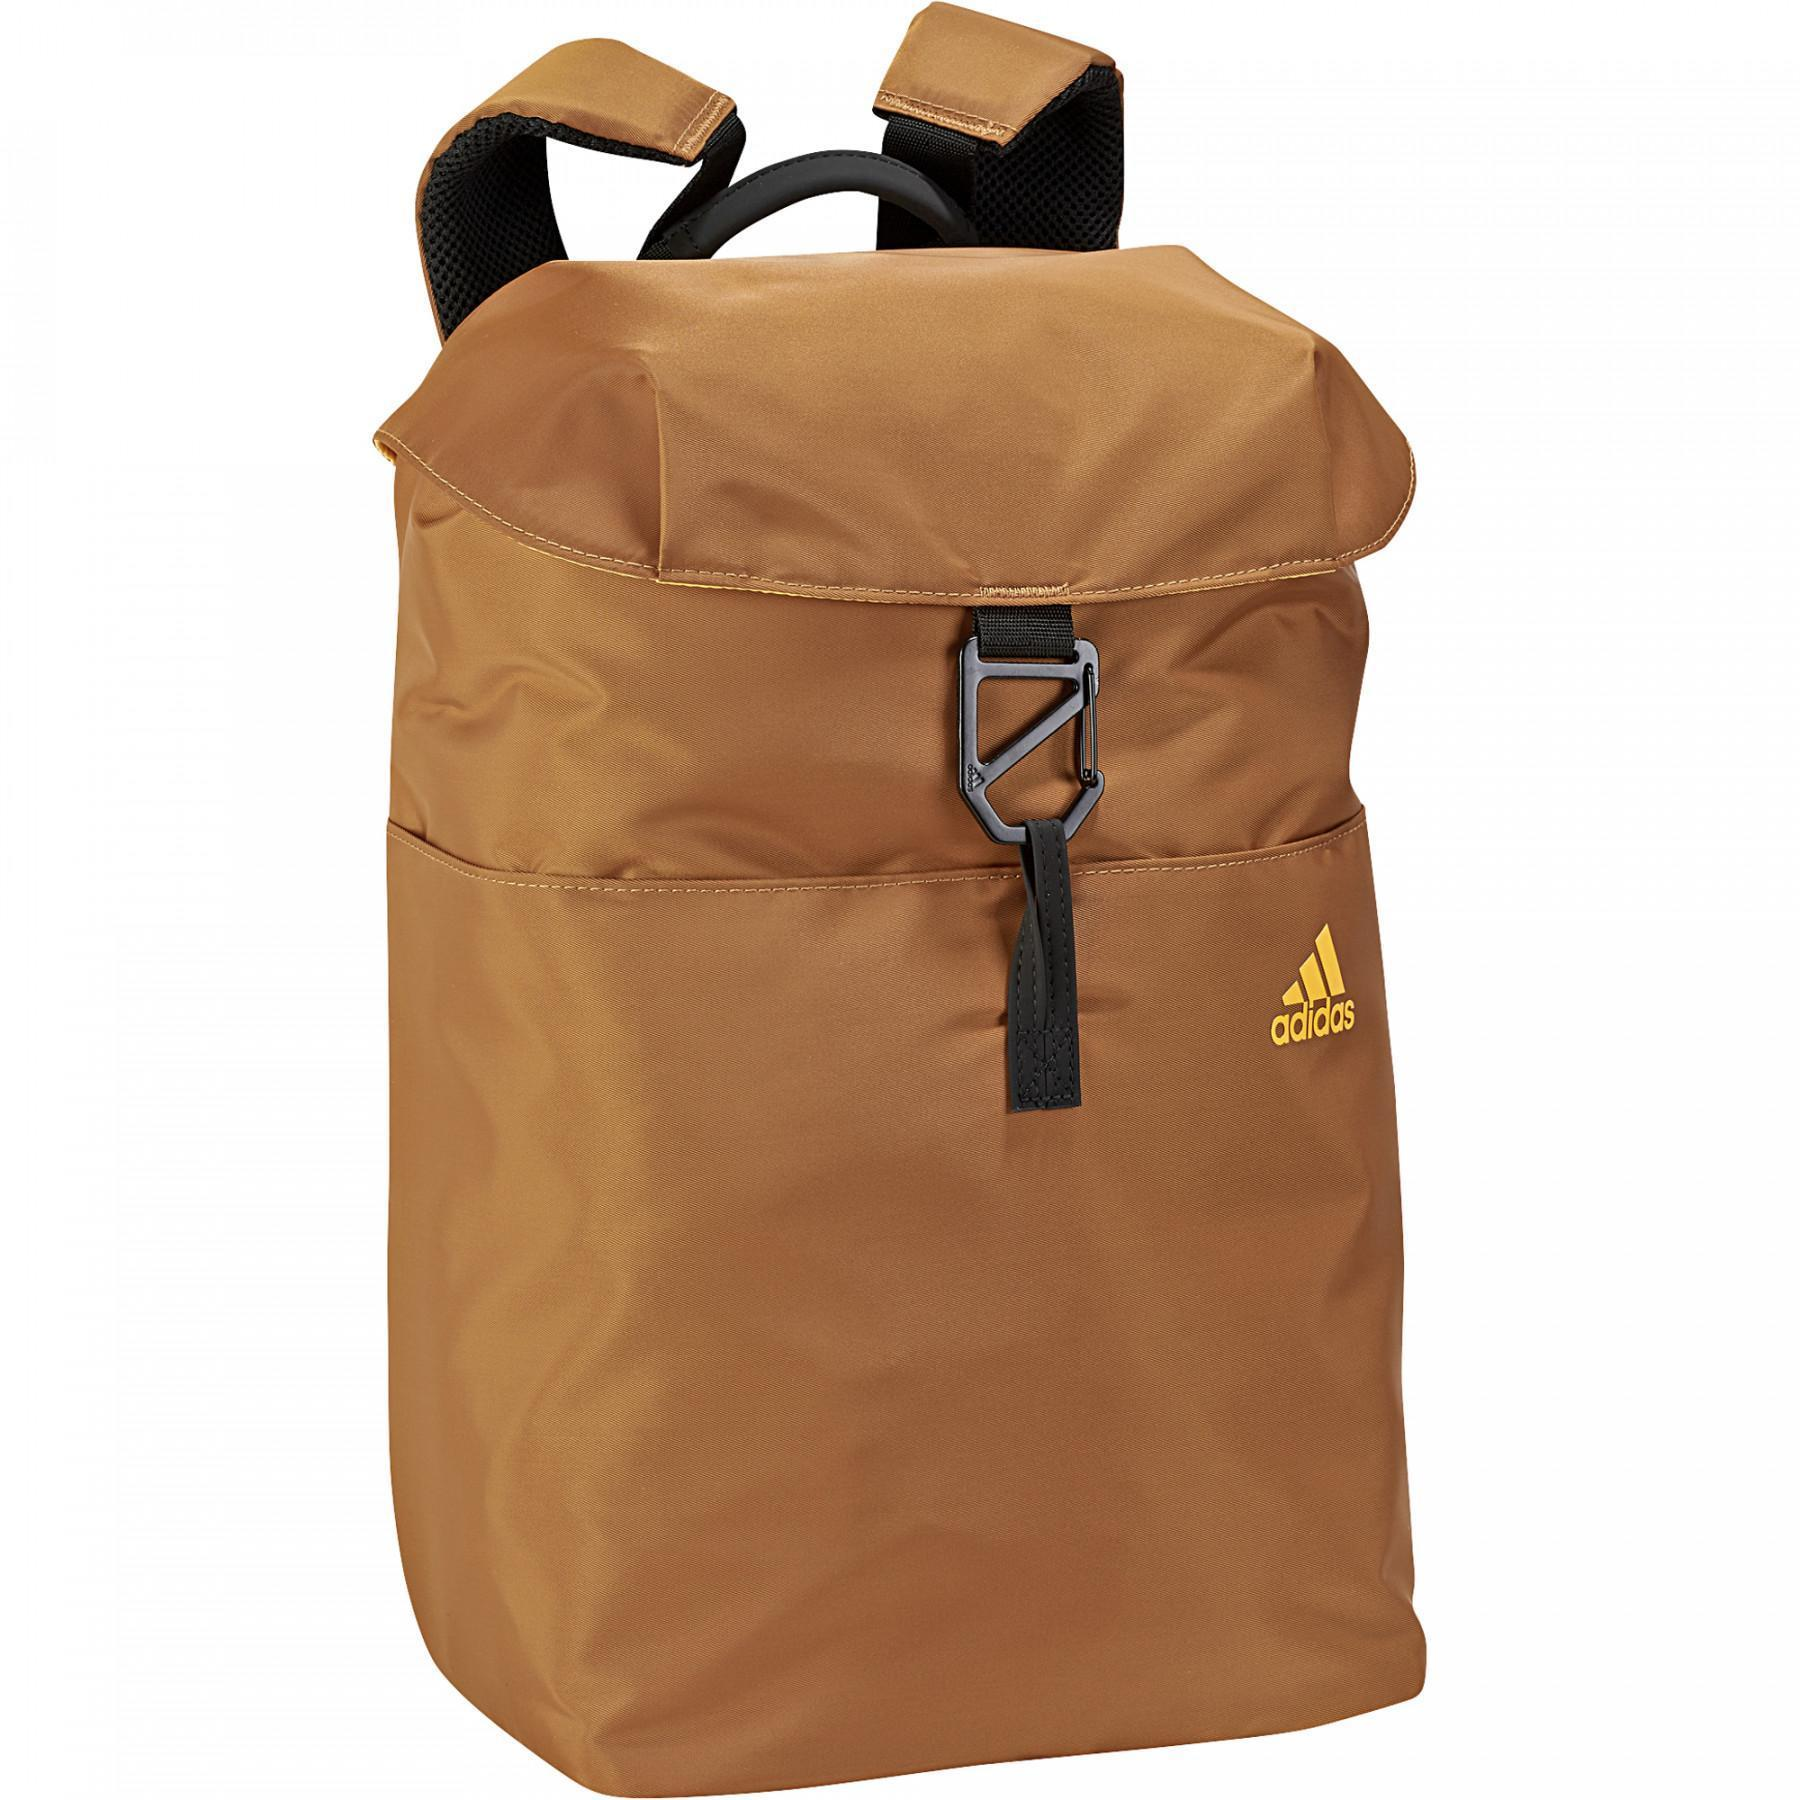 Women's backpack adidas ID Flap